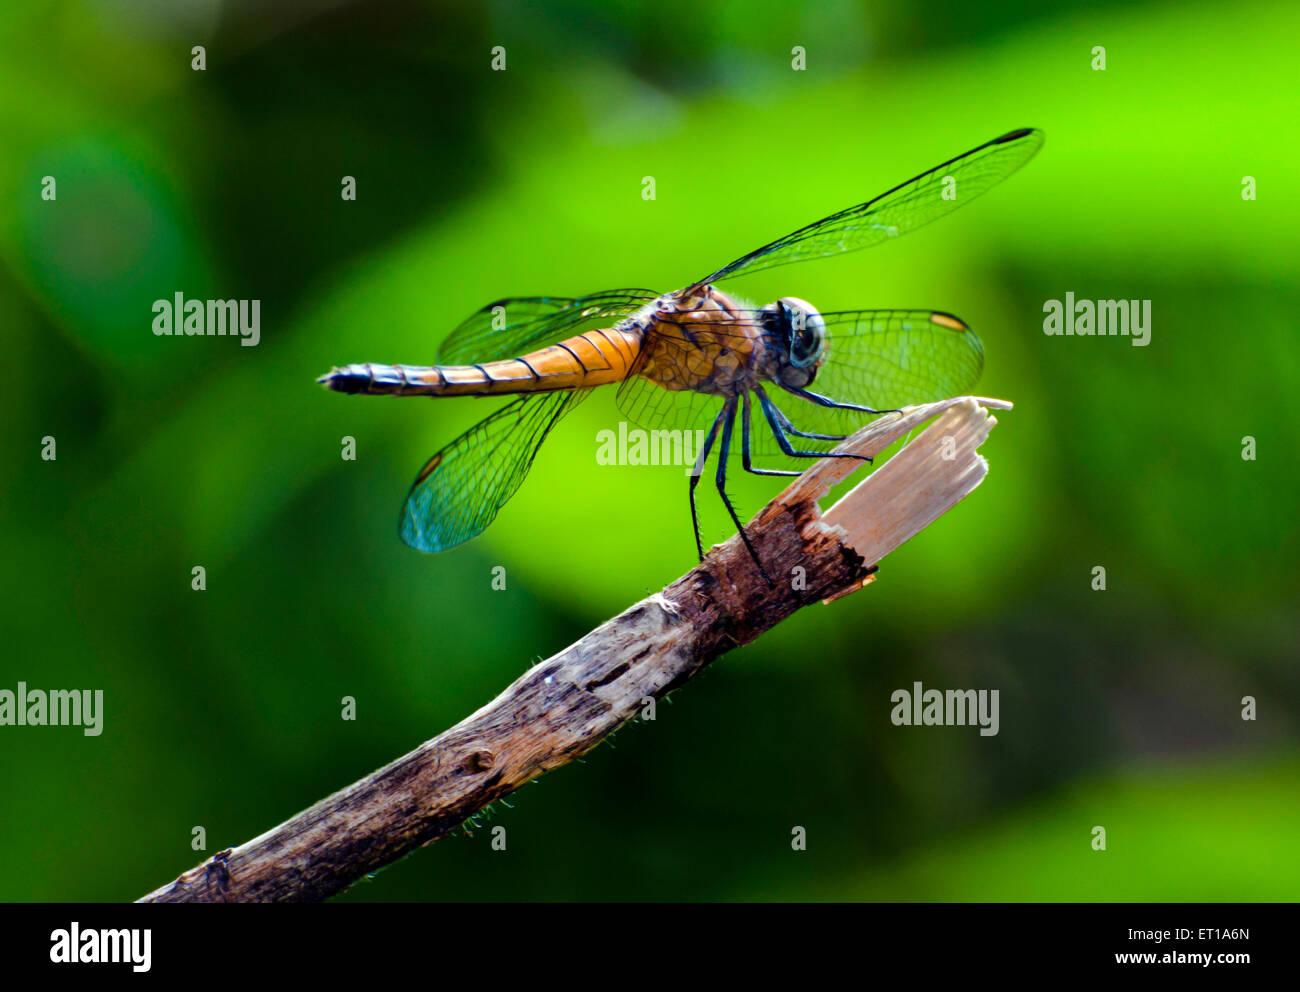 Dragonfly Jardín Botánico Howrah West Bengal India Asia Foto de stock